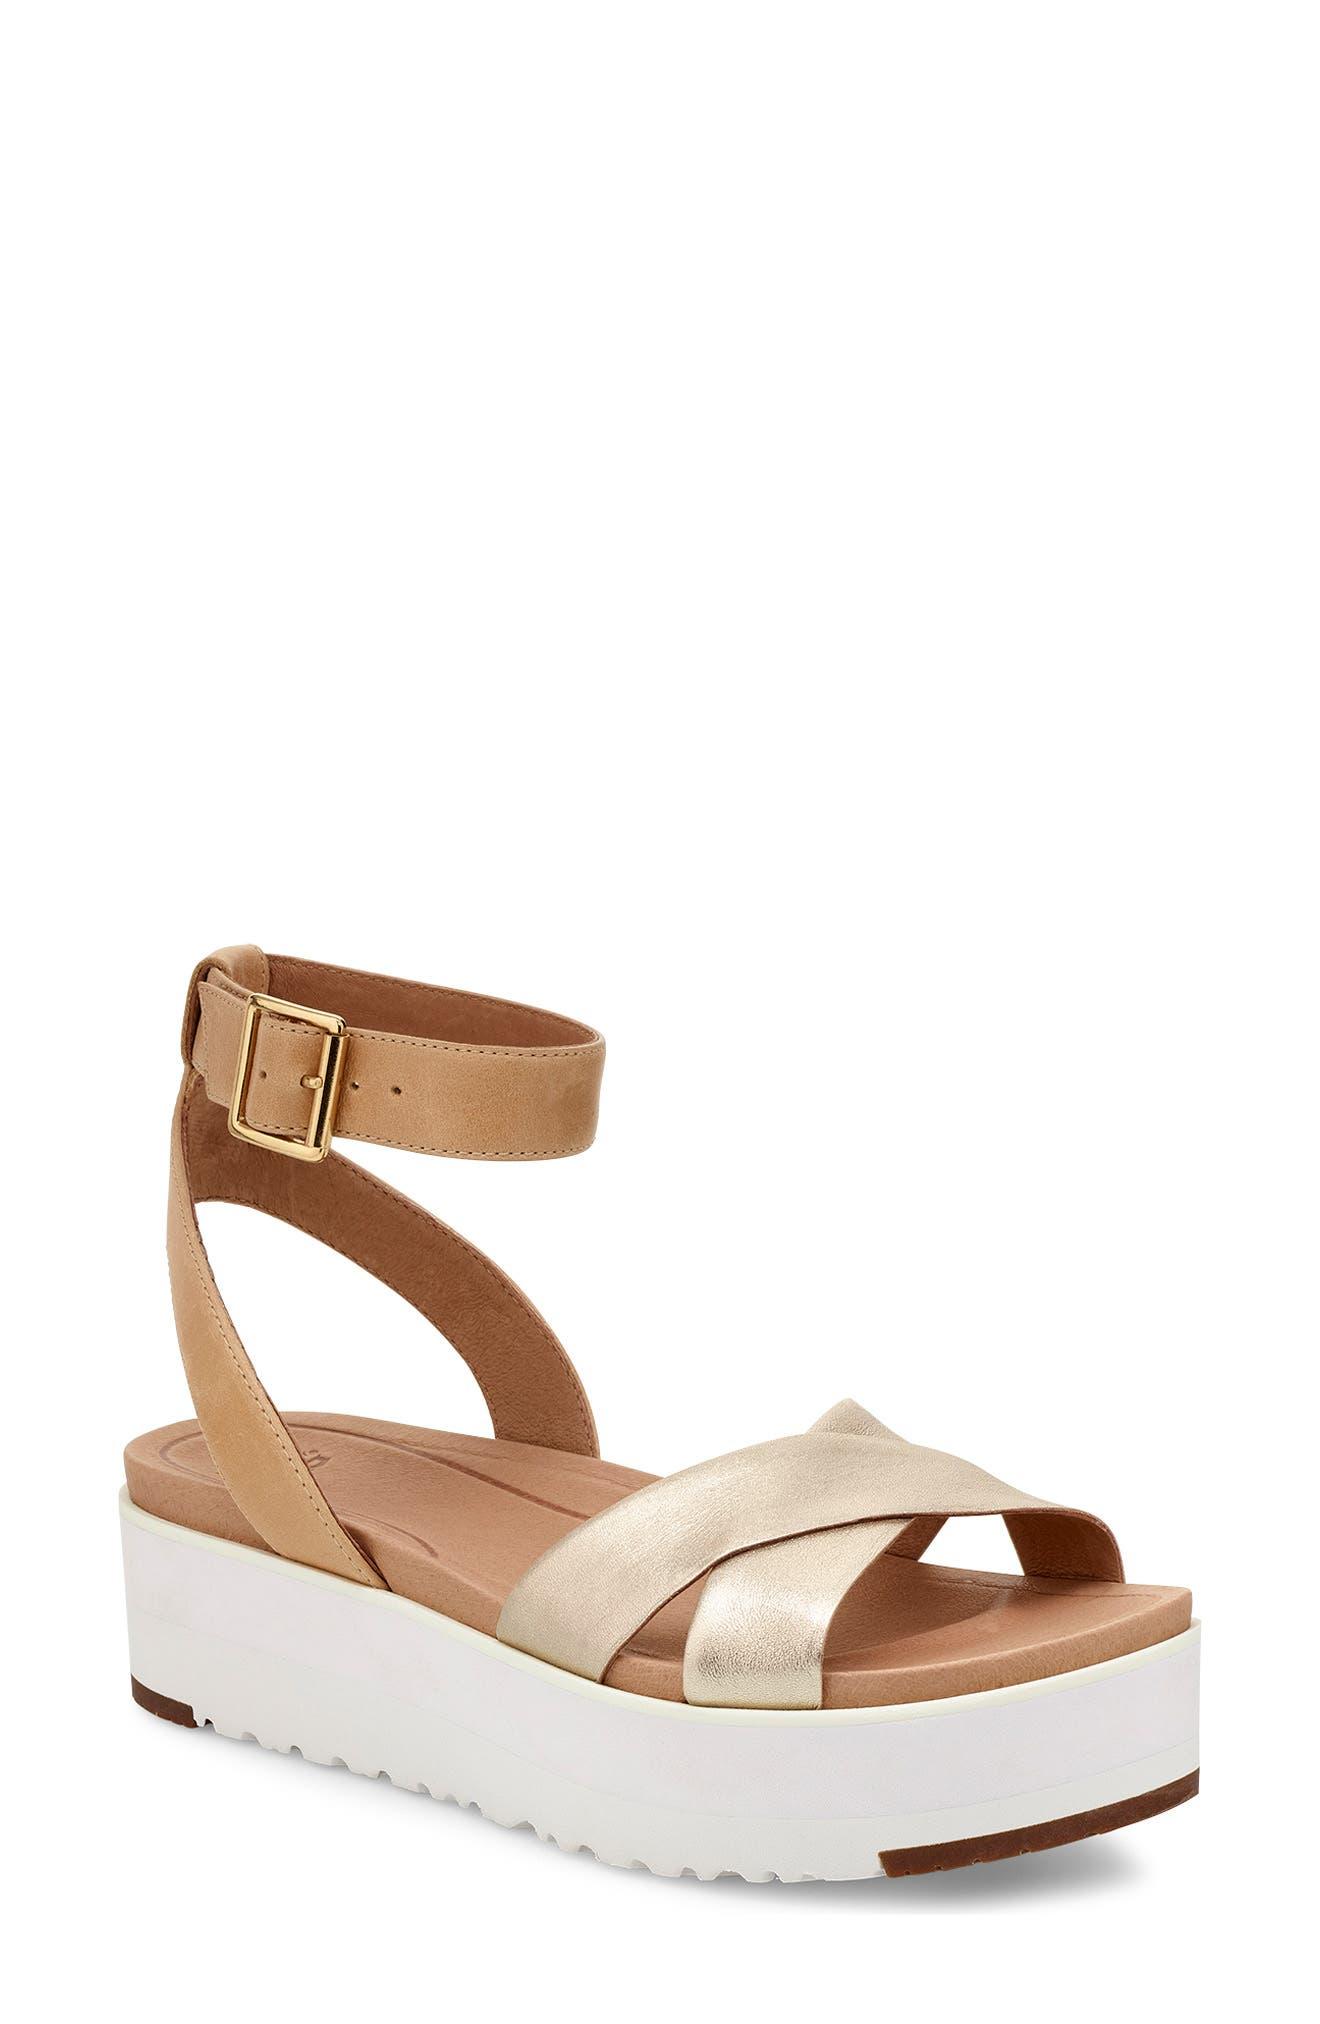 Tipton Metallic Platform Sandal, Main, color, GOLD